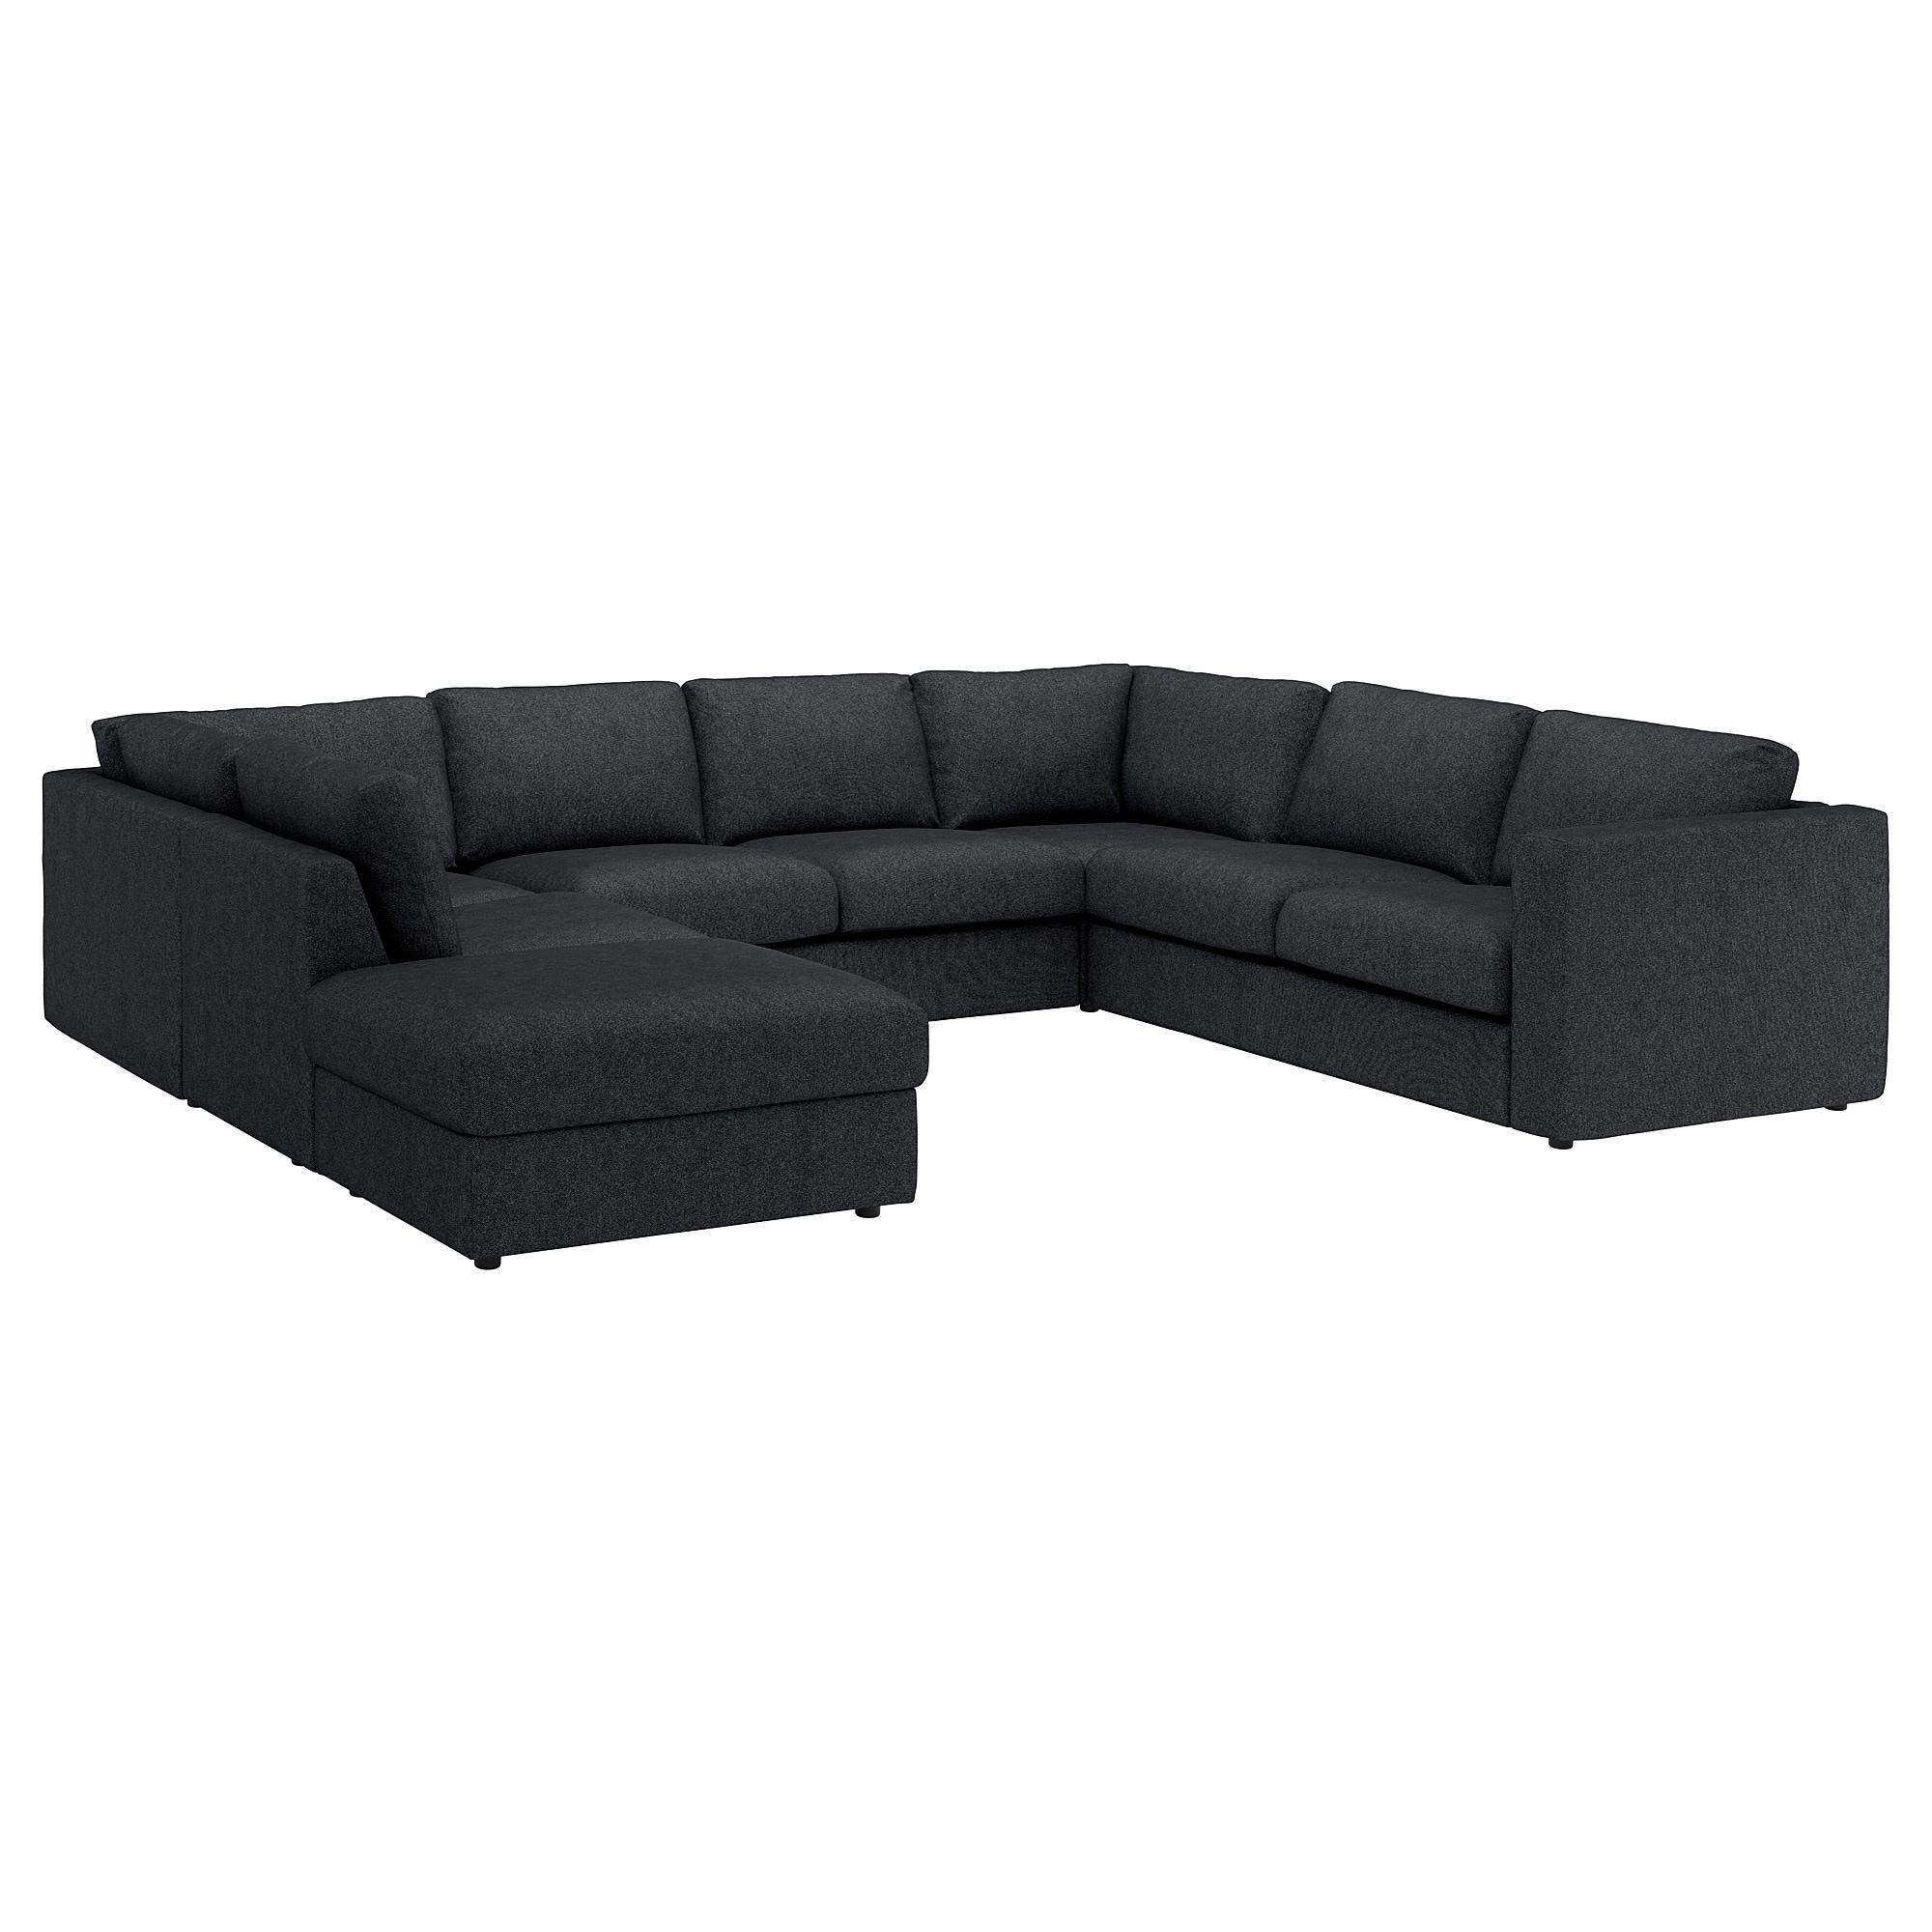 Kibuc sofas Cama Tqd3 sofà S Modulares Pra Online Ikea